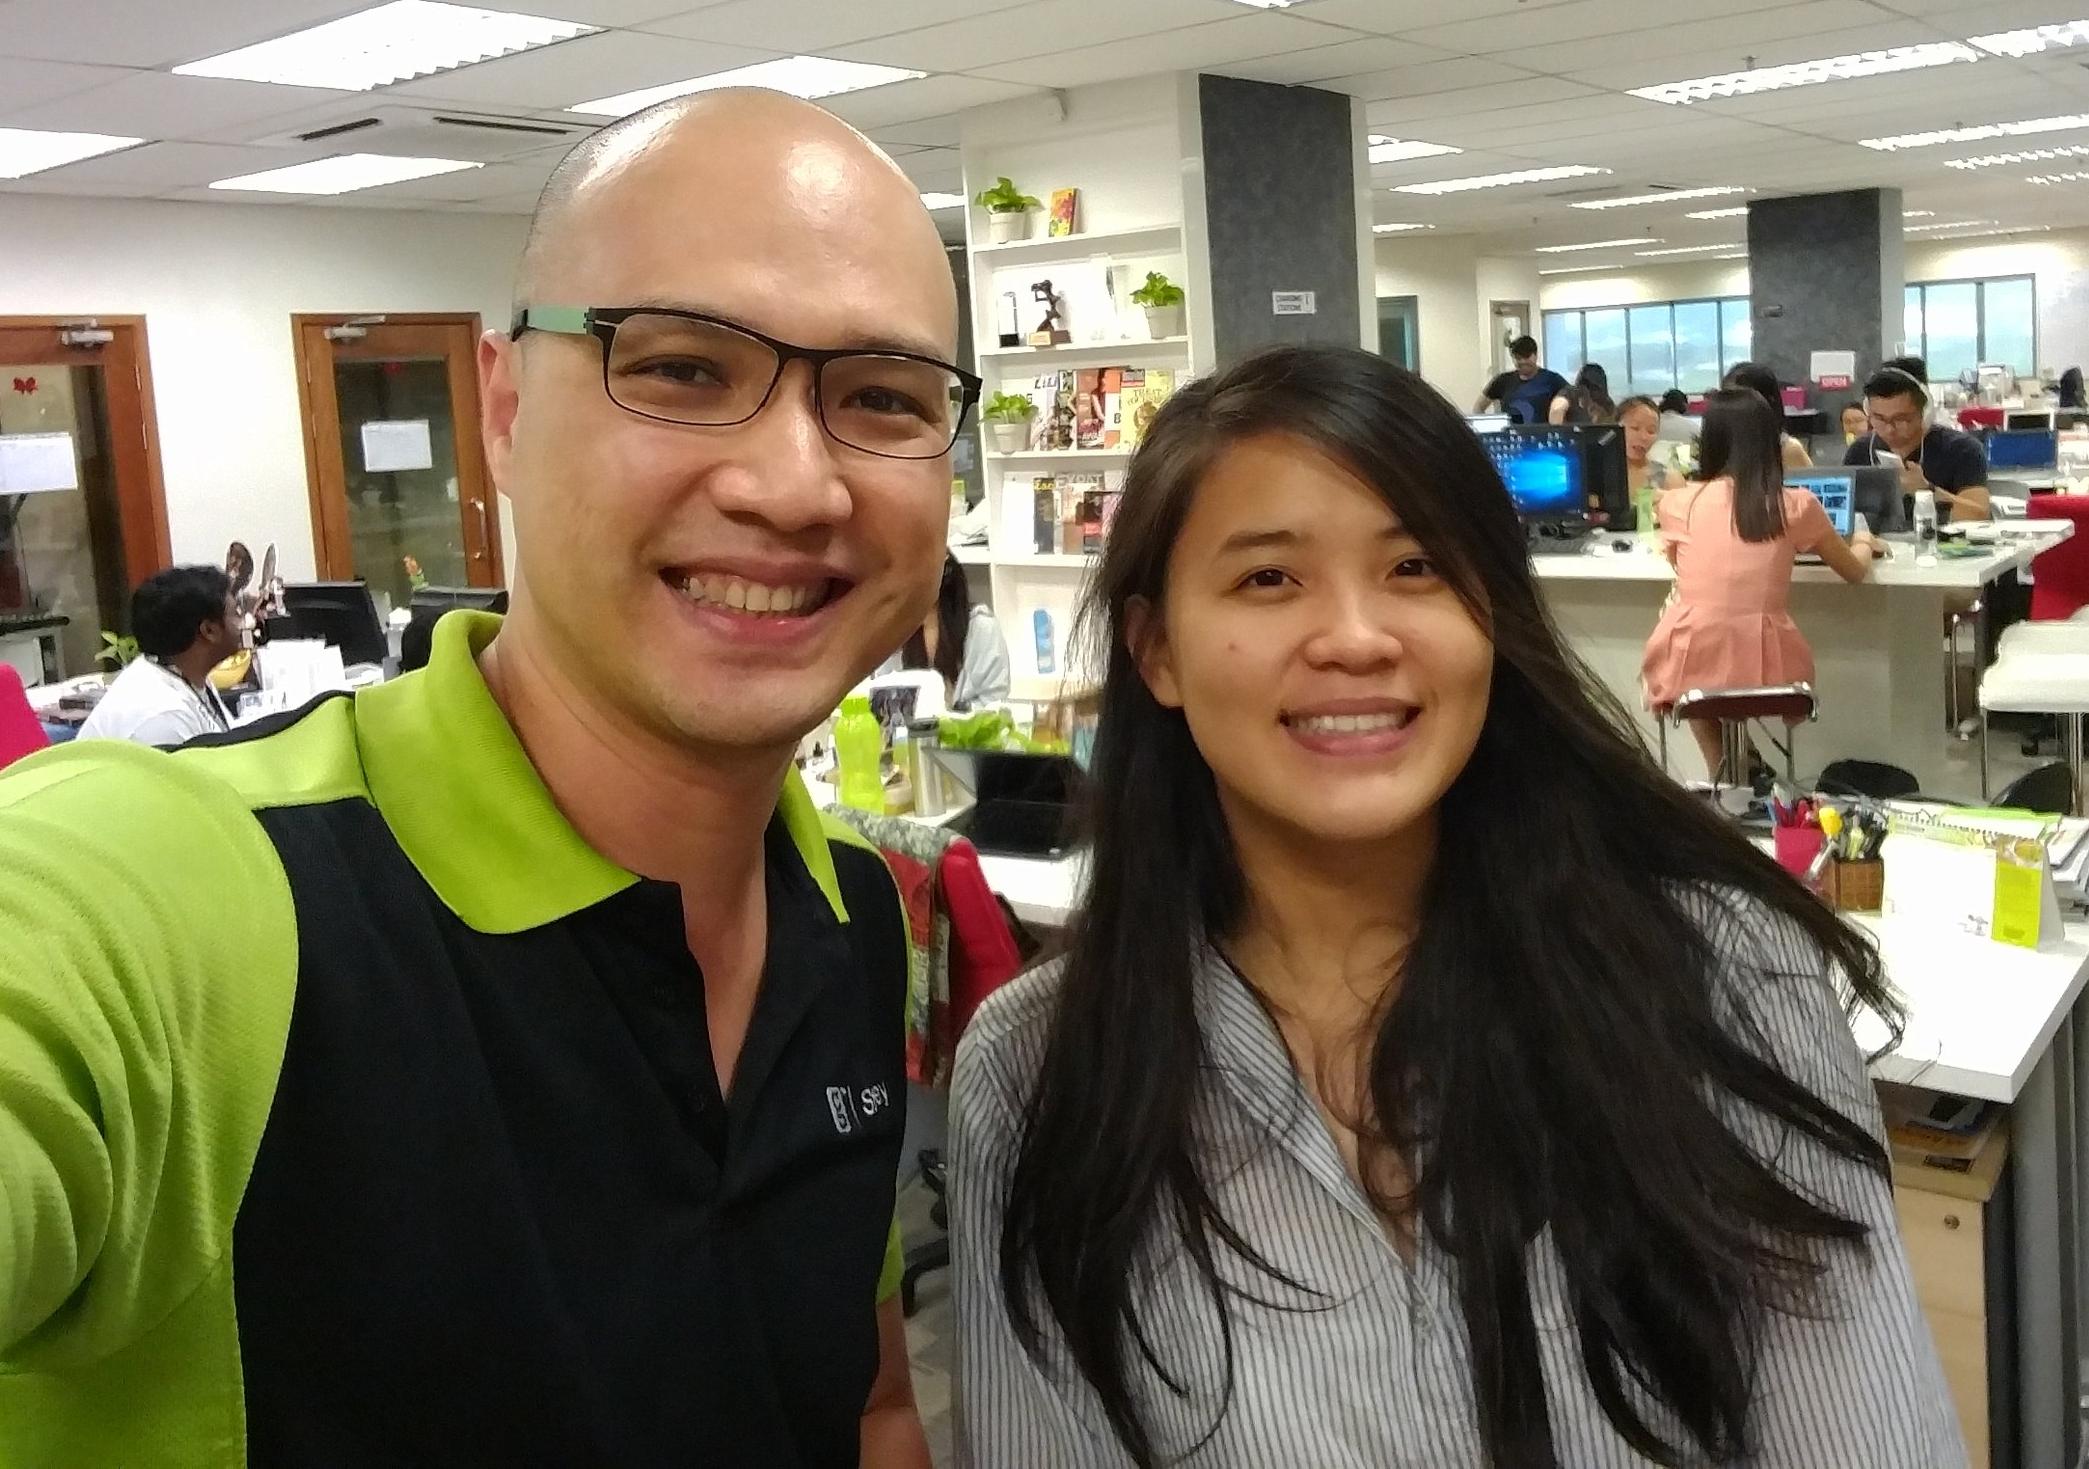 Gapture®'s Founder Stanley Chee was interviewed by BFM's Angeline Teh.